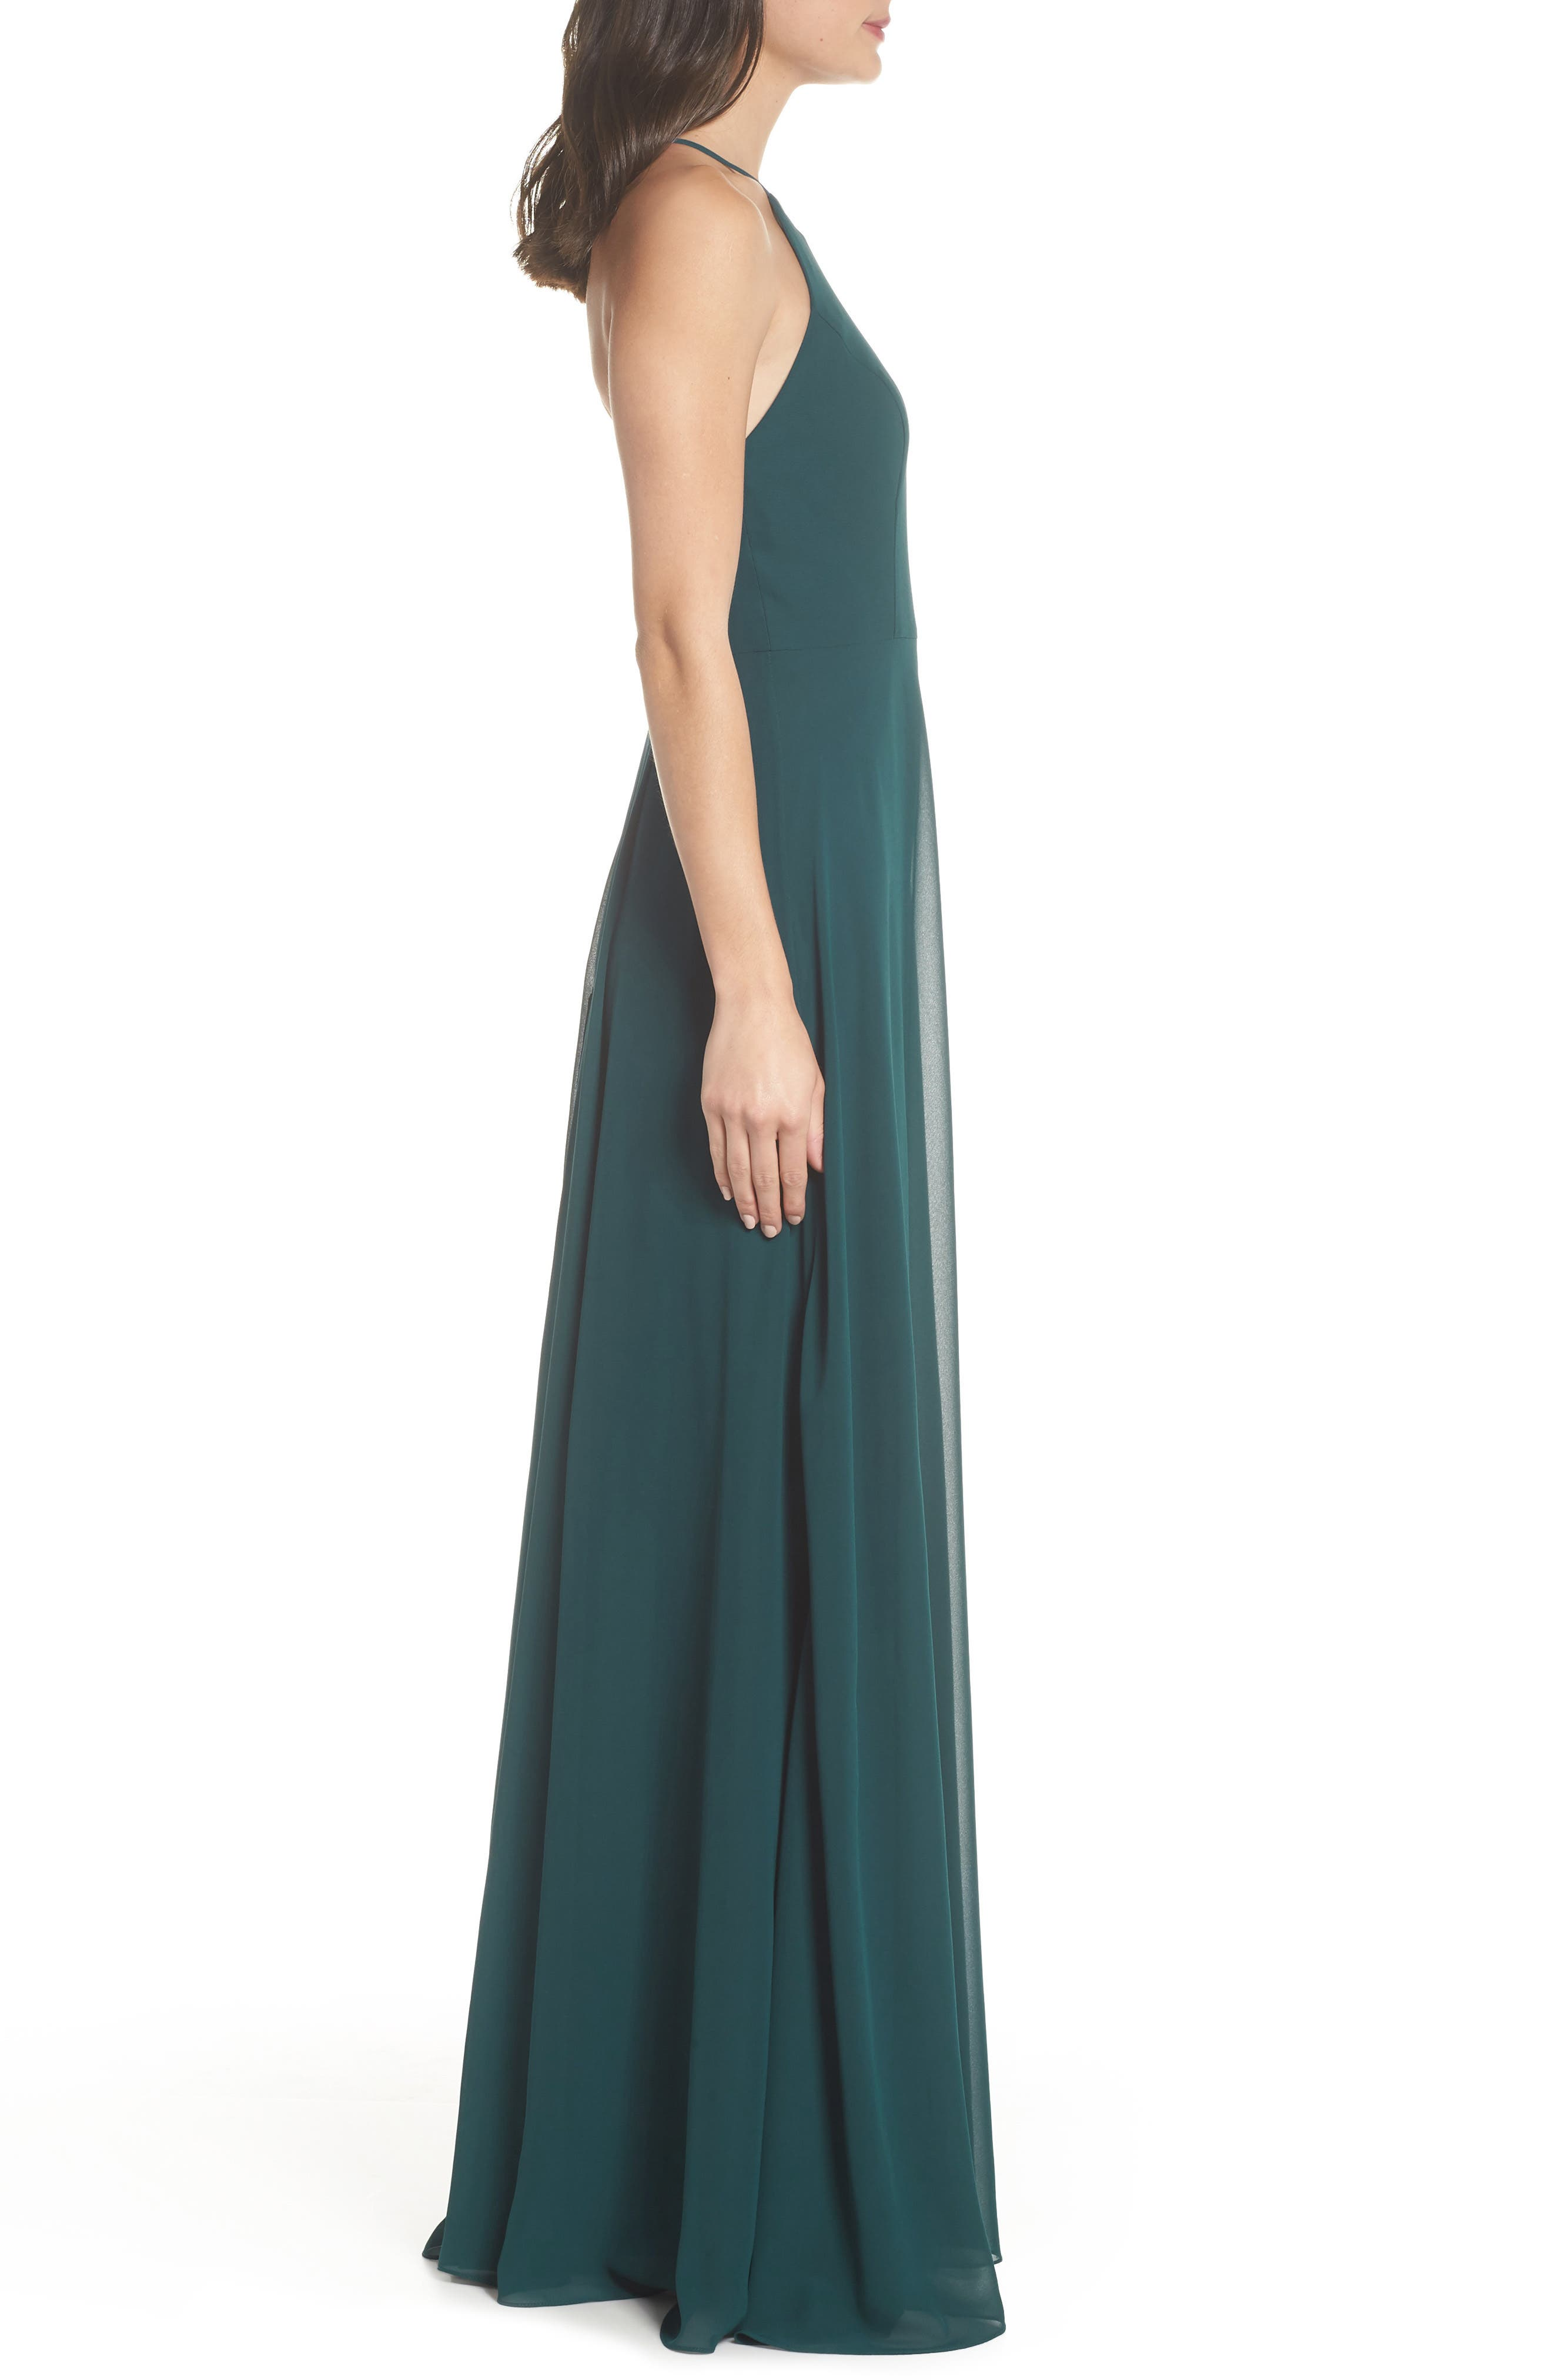 JENNY YOO, Kayla A-Line Halter Gown, Alternate thumbnail 4, color, CASPIAN SEA